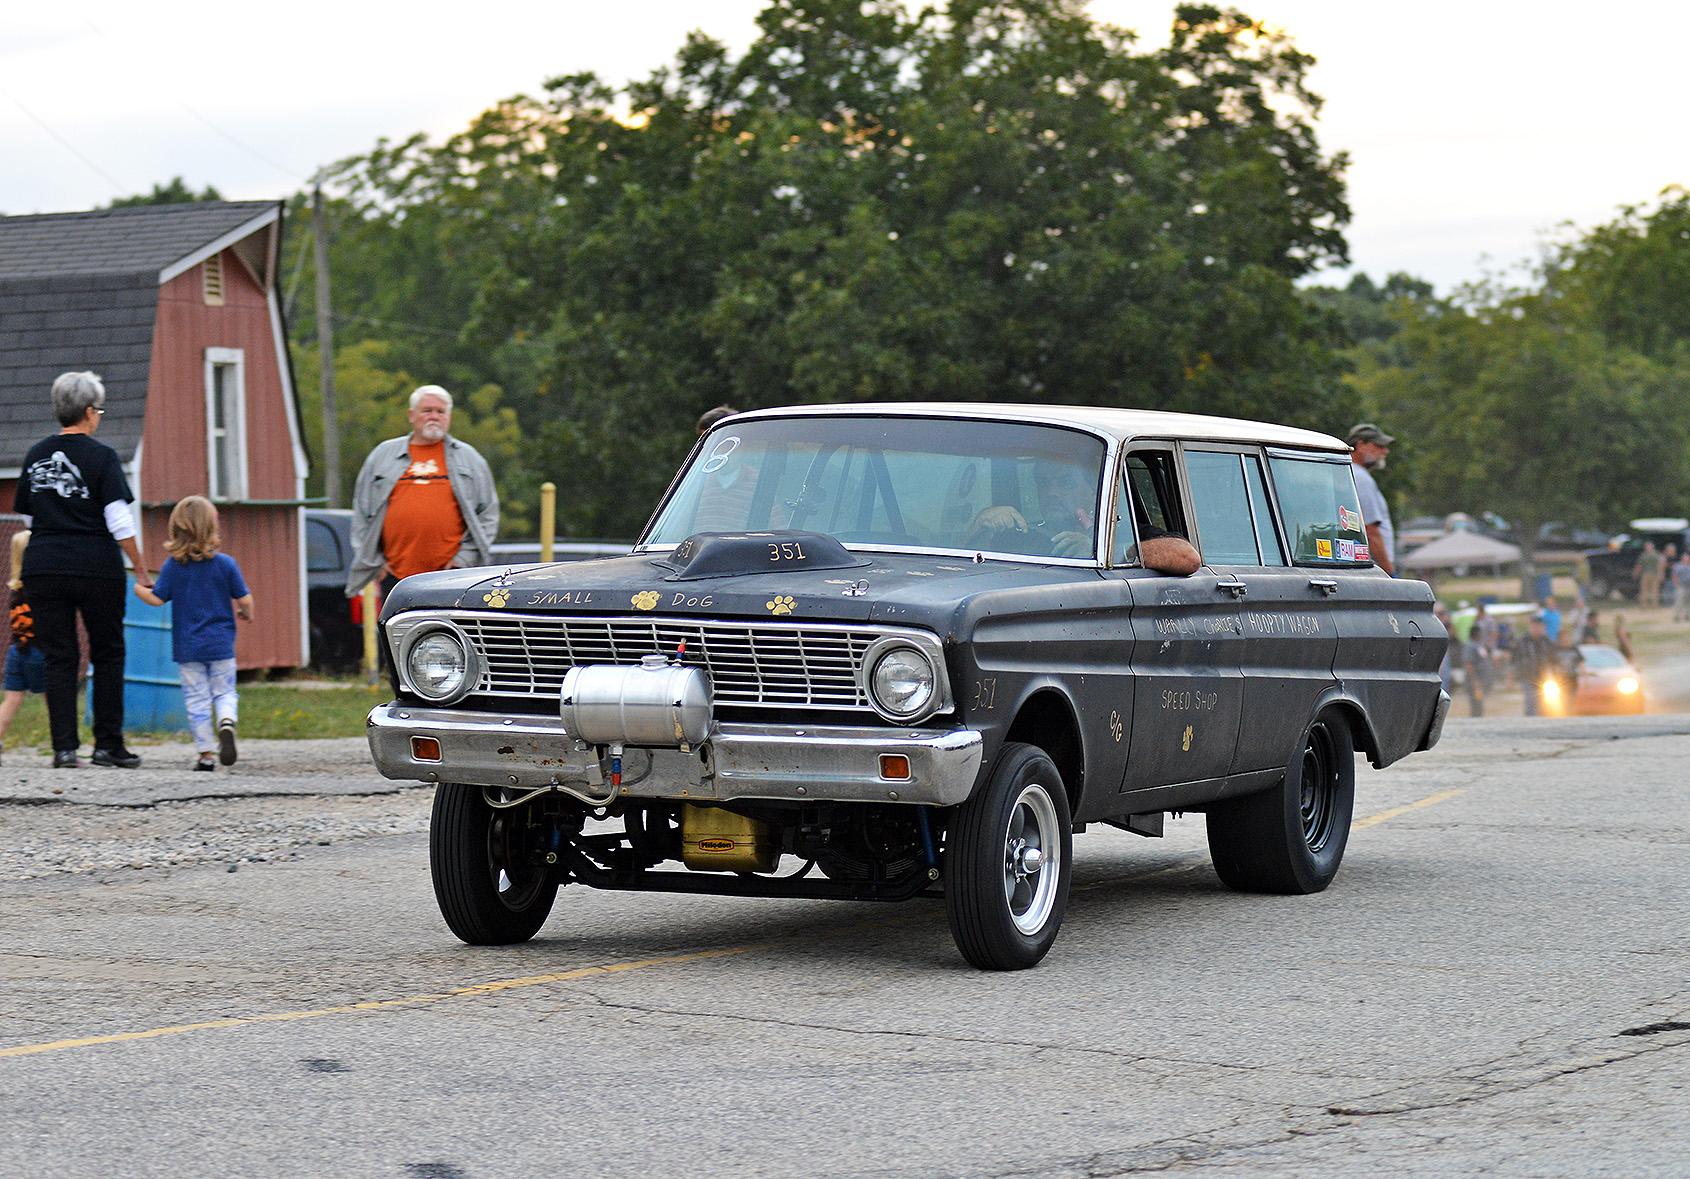 2014-9-27 Ware S_053 Warrly Charlie\'s Hoopty Wagon Falcon Gasser_Fl.jpg